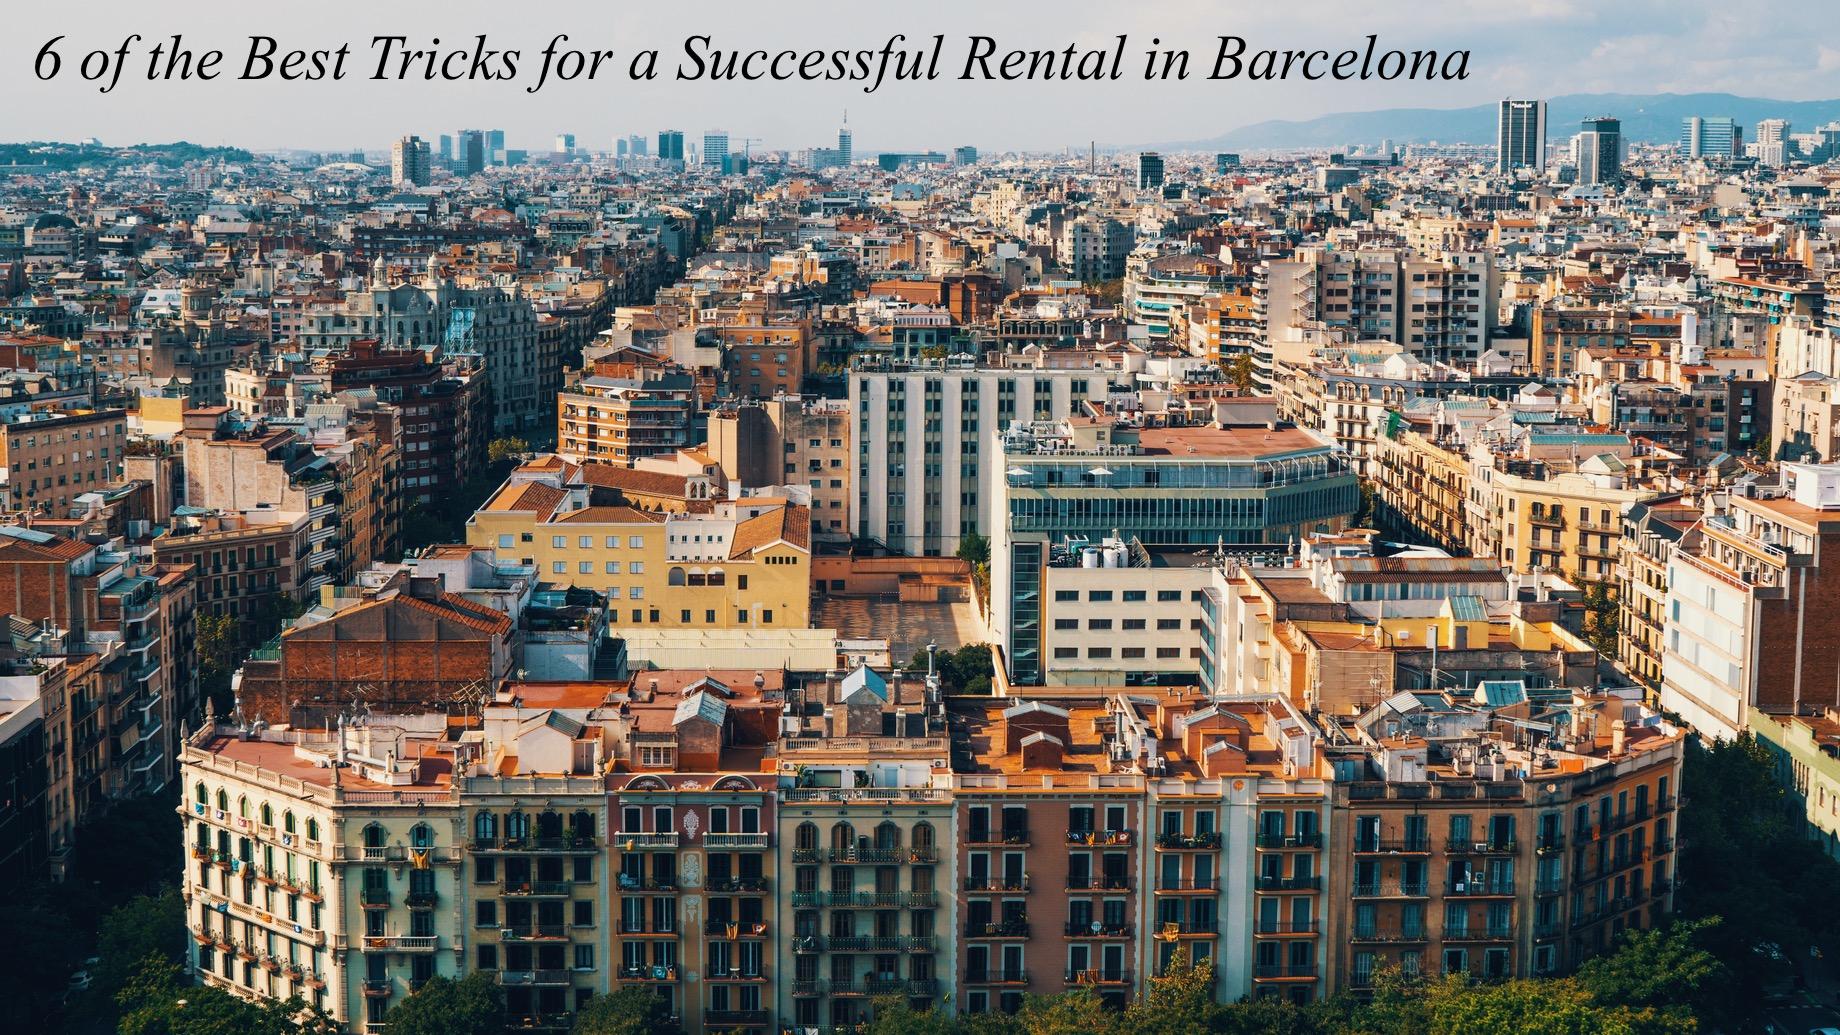 Flat Rental in Barcelona - 6 of Best Tricks for a Successful Rental